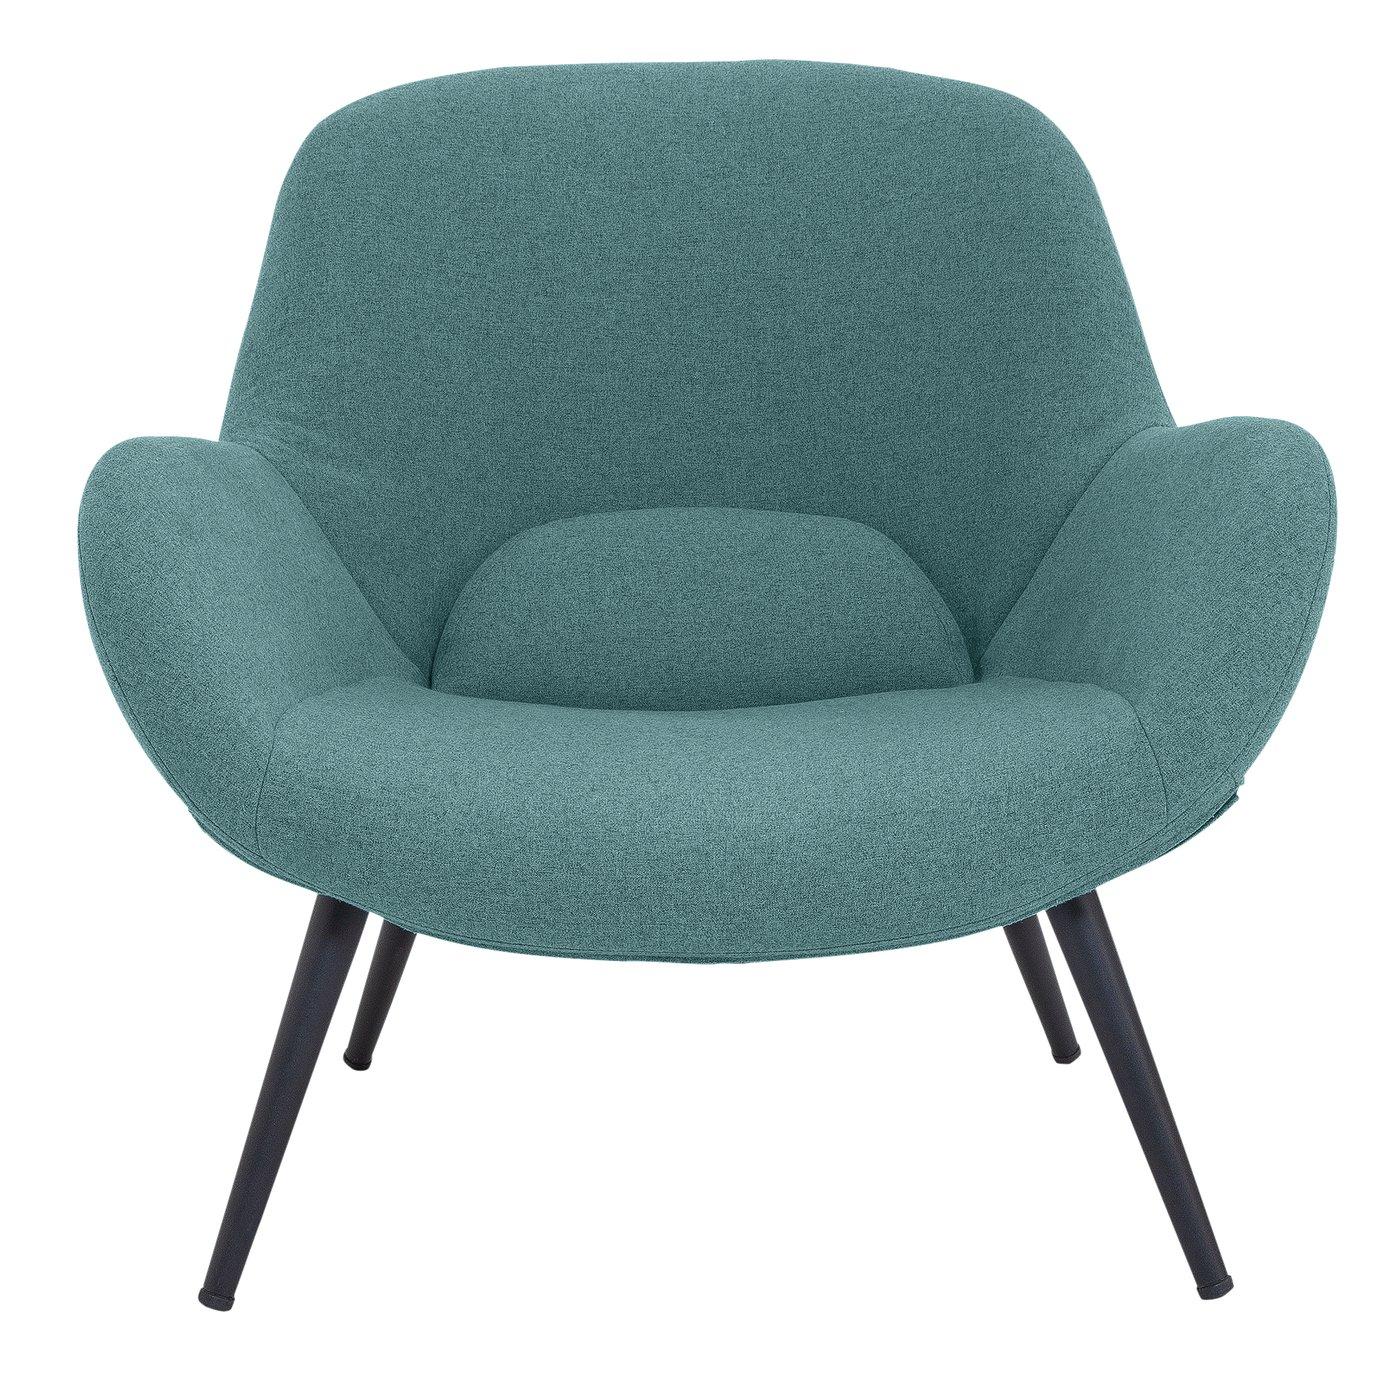 Argos Home Ollie Fabric Accent Chair - Teal